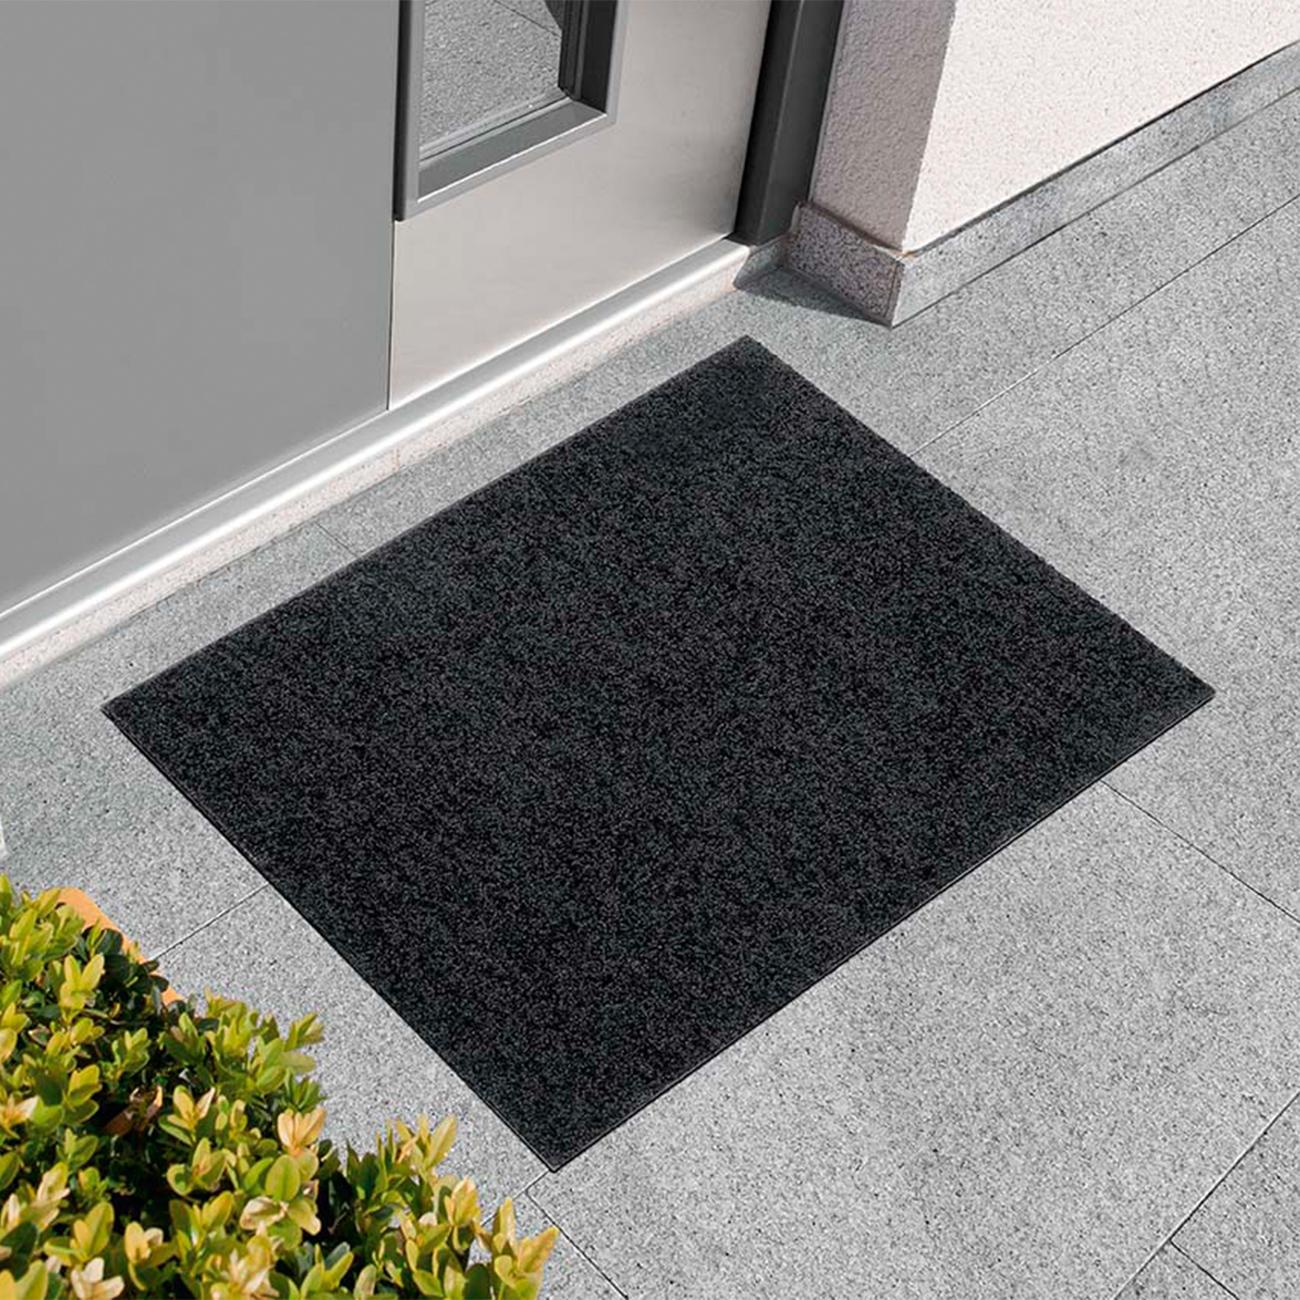 casa pura premium fu matte sauberlaufmatte f r eingangsbereiche fu abtreter mit testnote 1. Black Bedroom Furniture Sets. Home Design Ideas